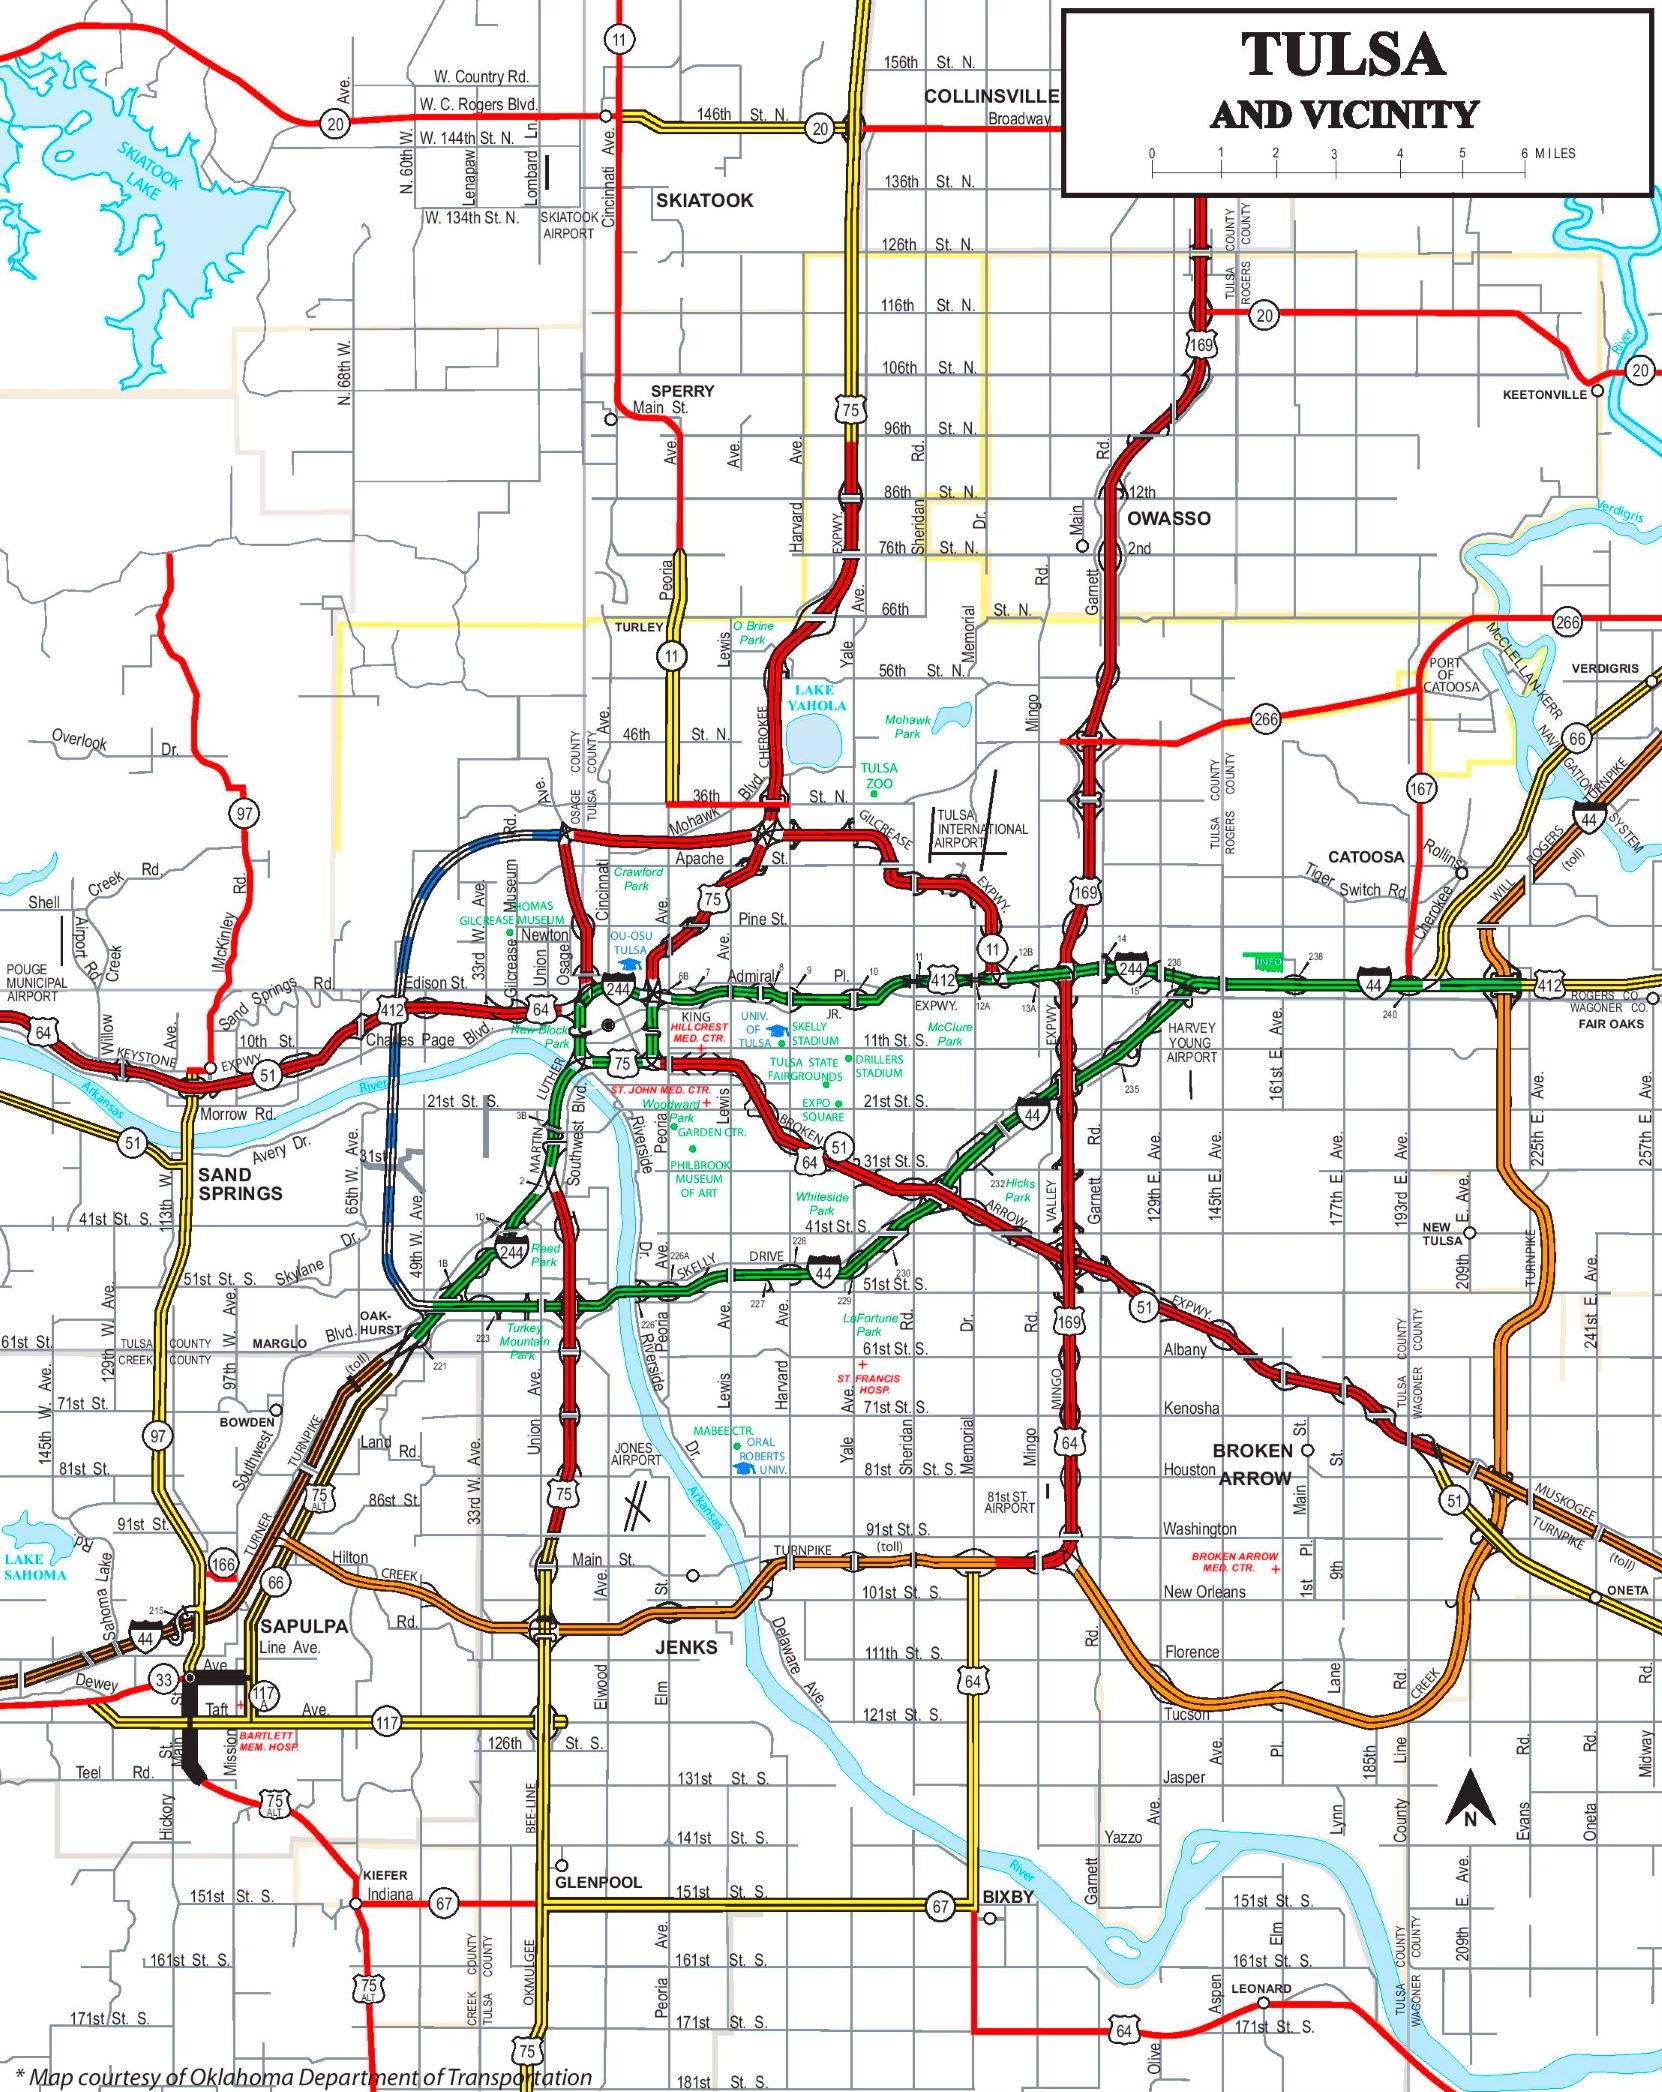 Map Of Tulsa Tulsa road map